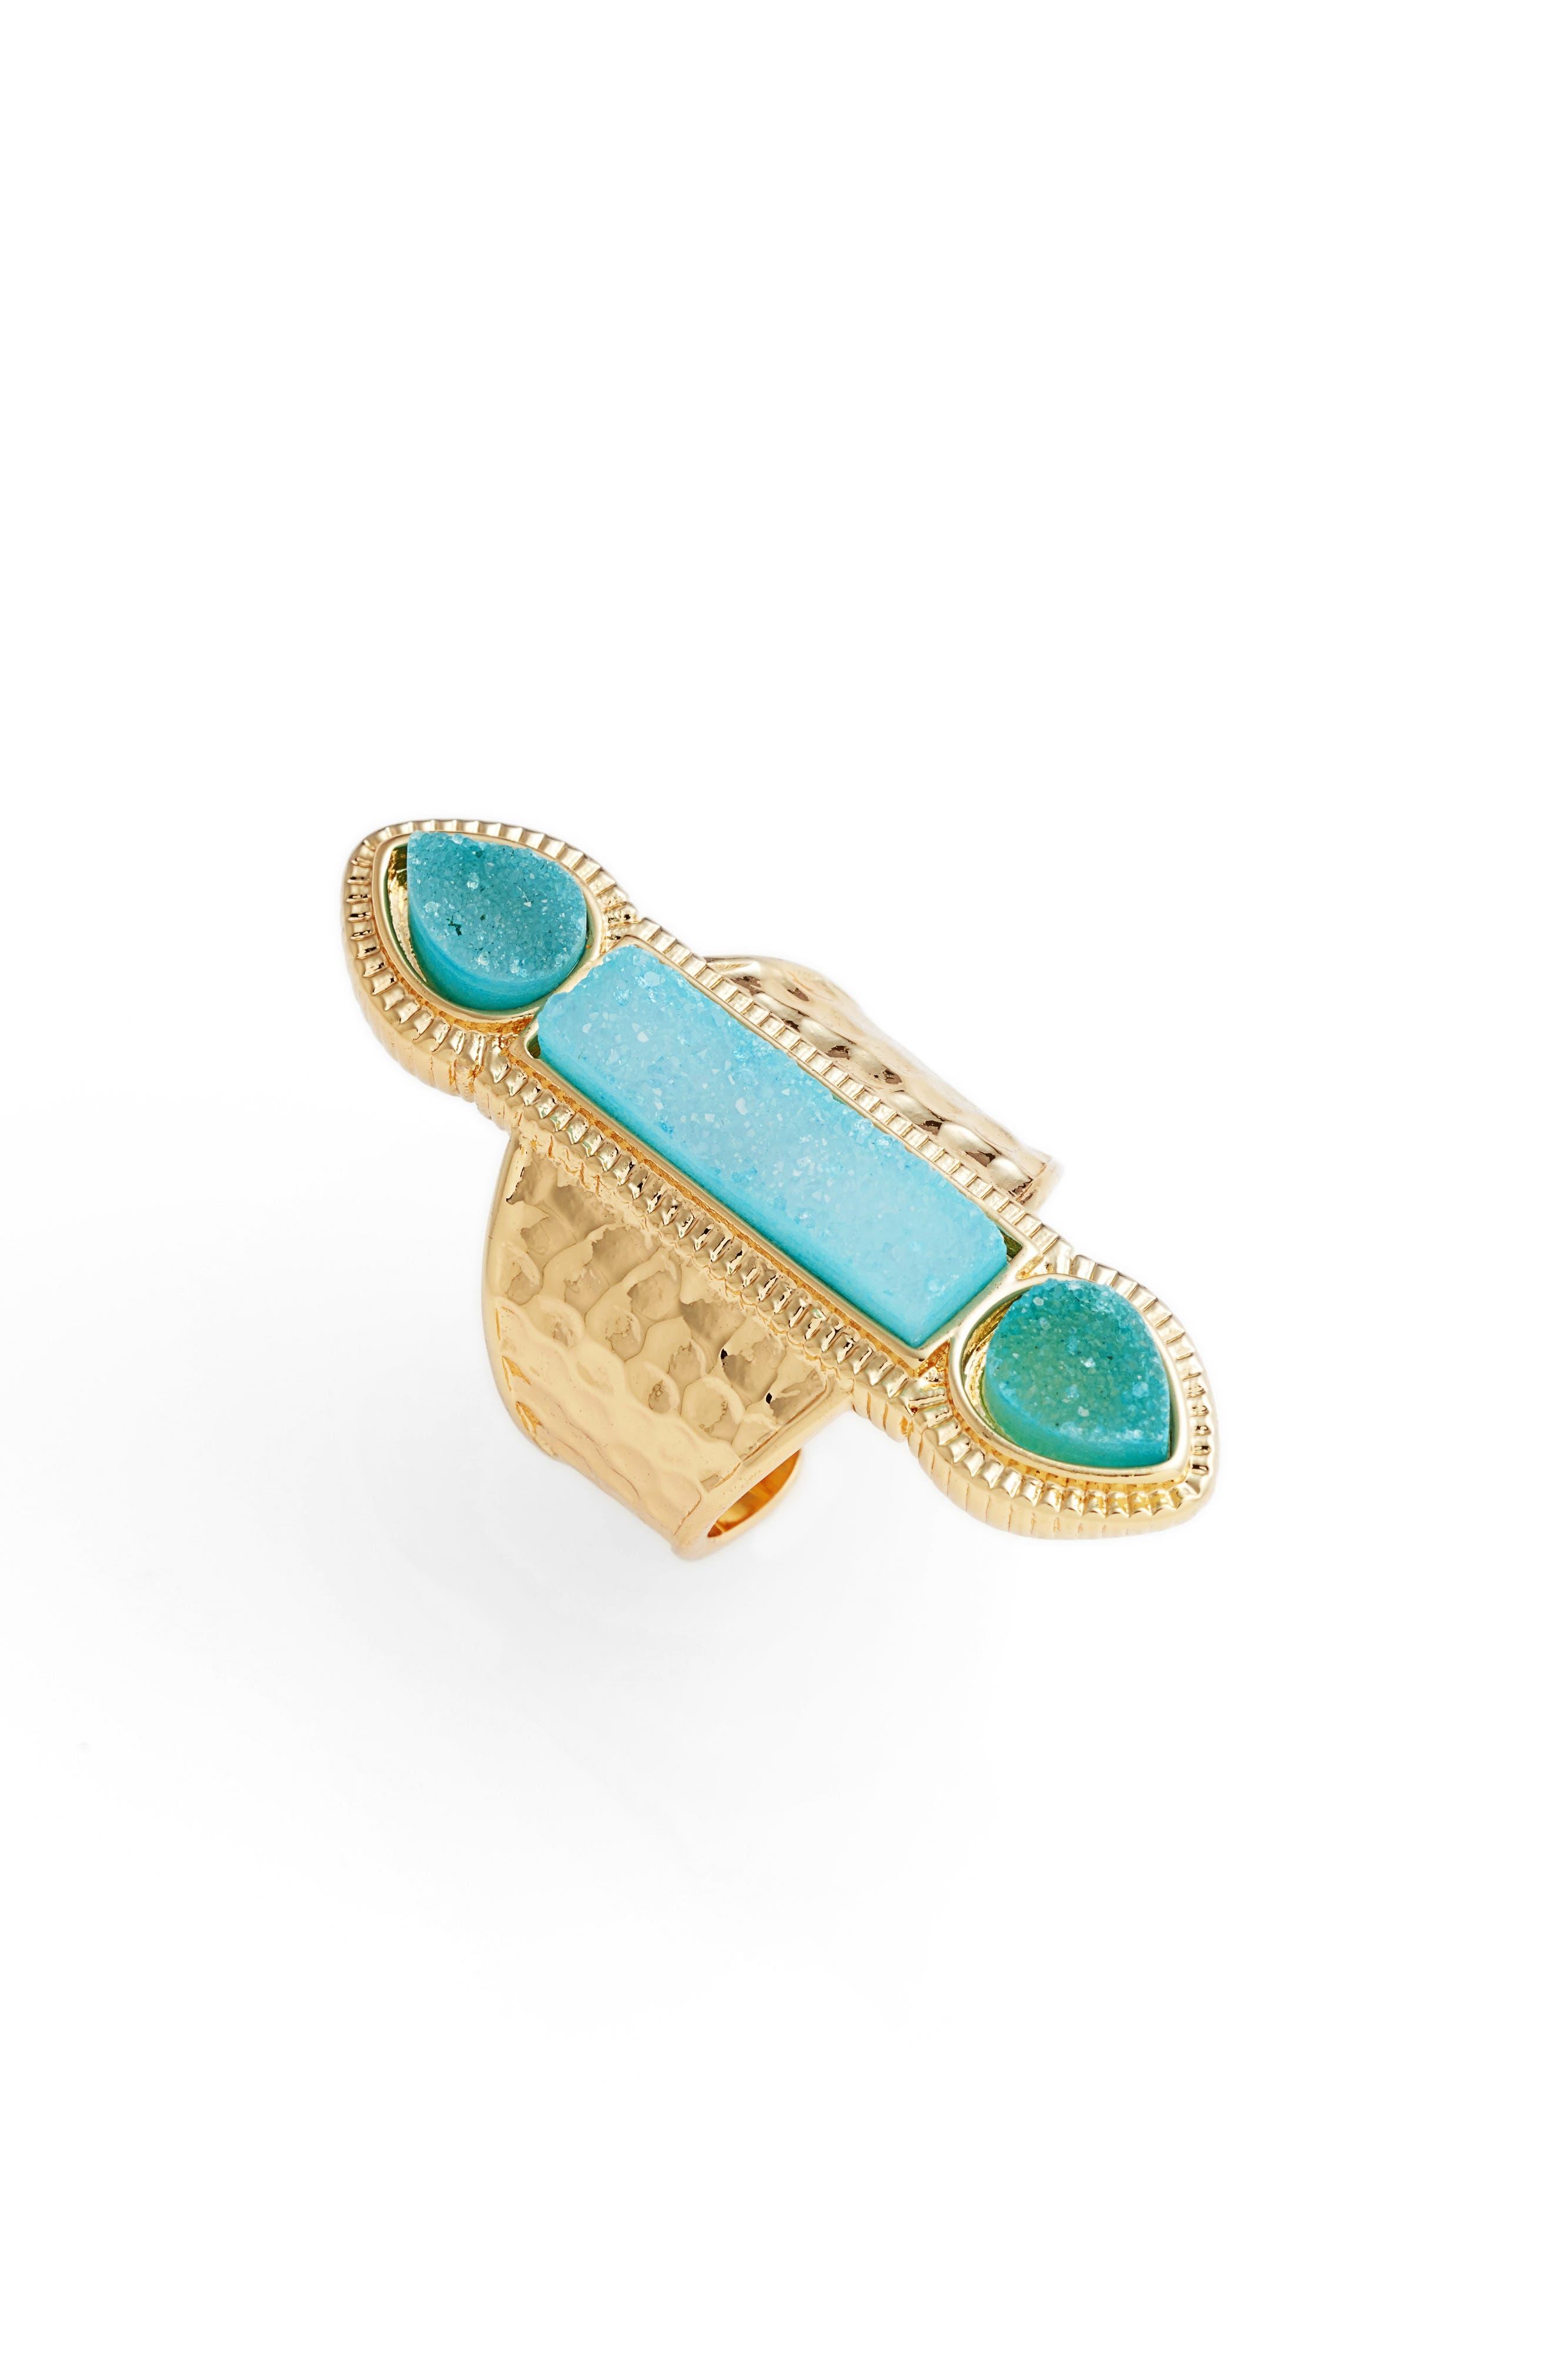 Elise M. Pyramid Drusy Quartz Adjustable Ring